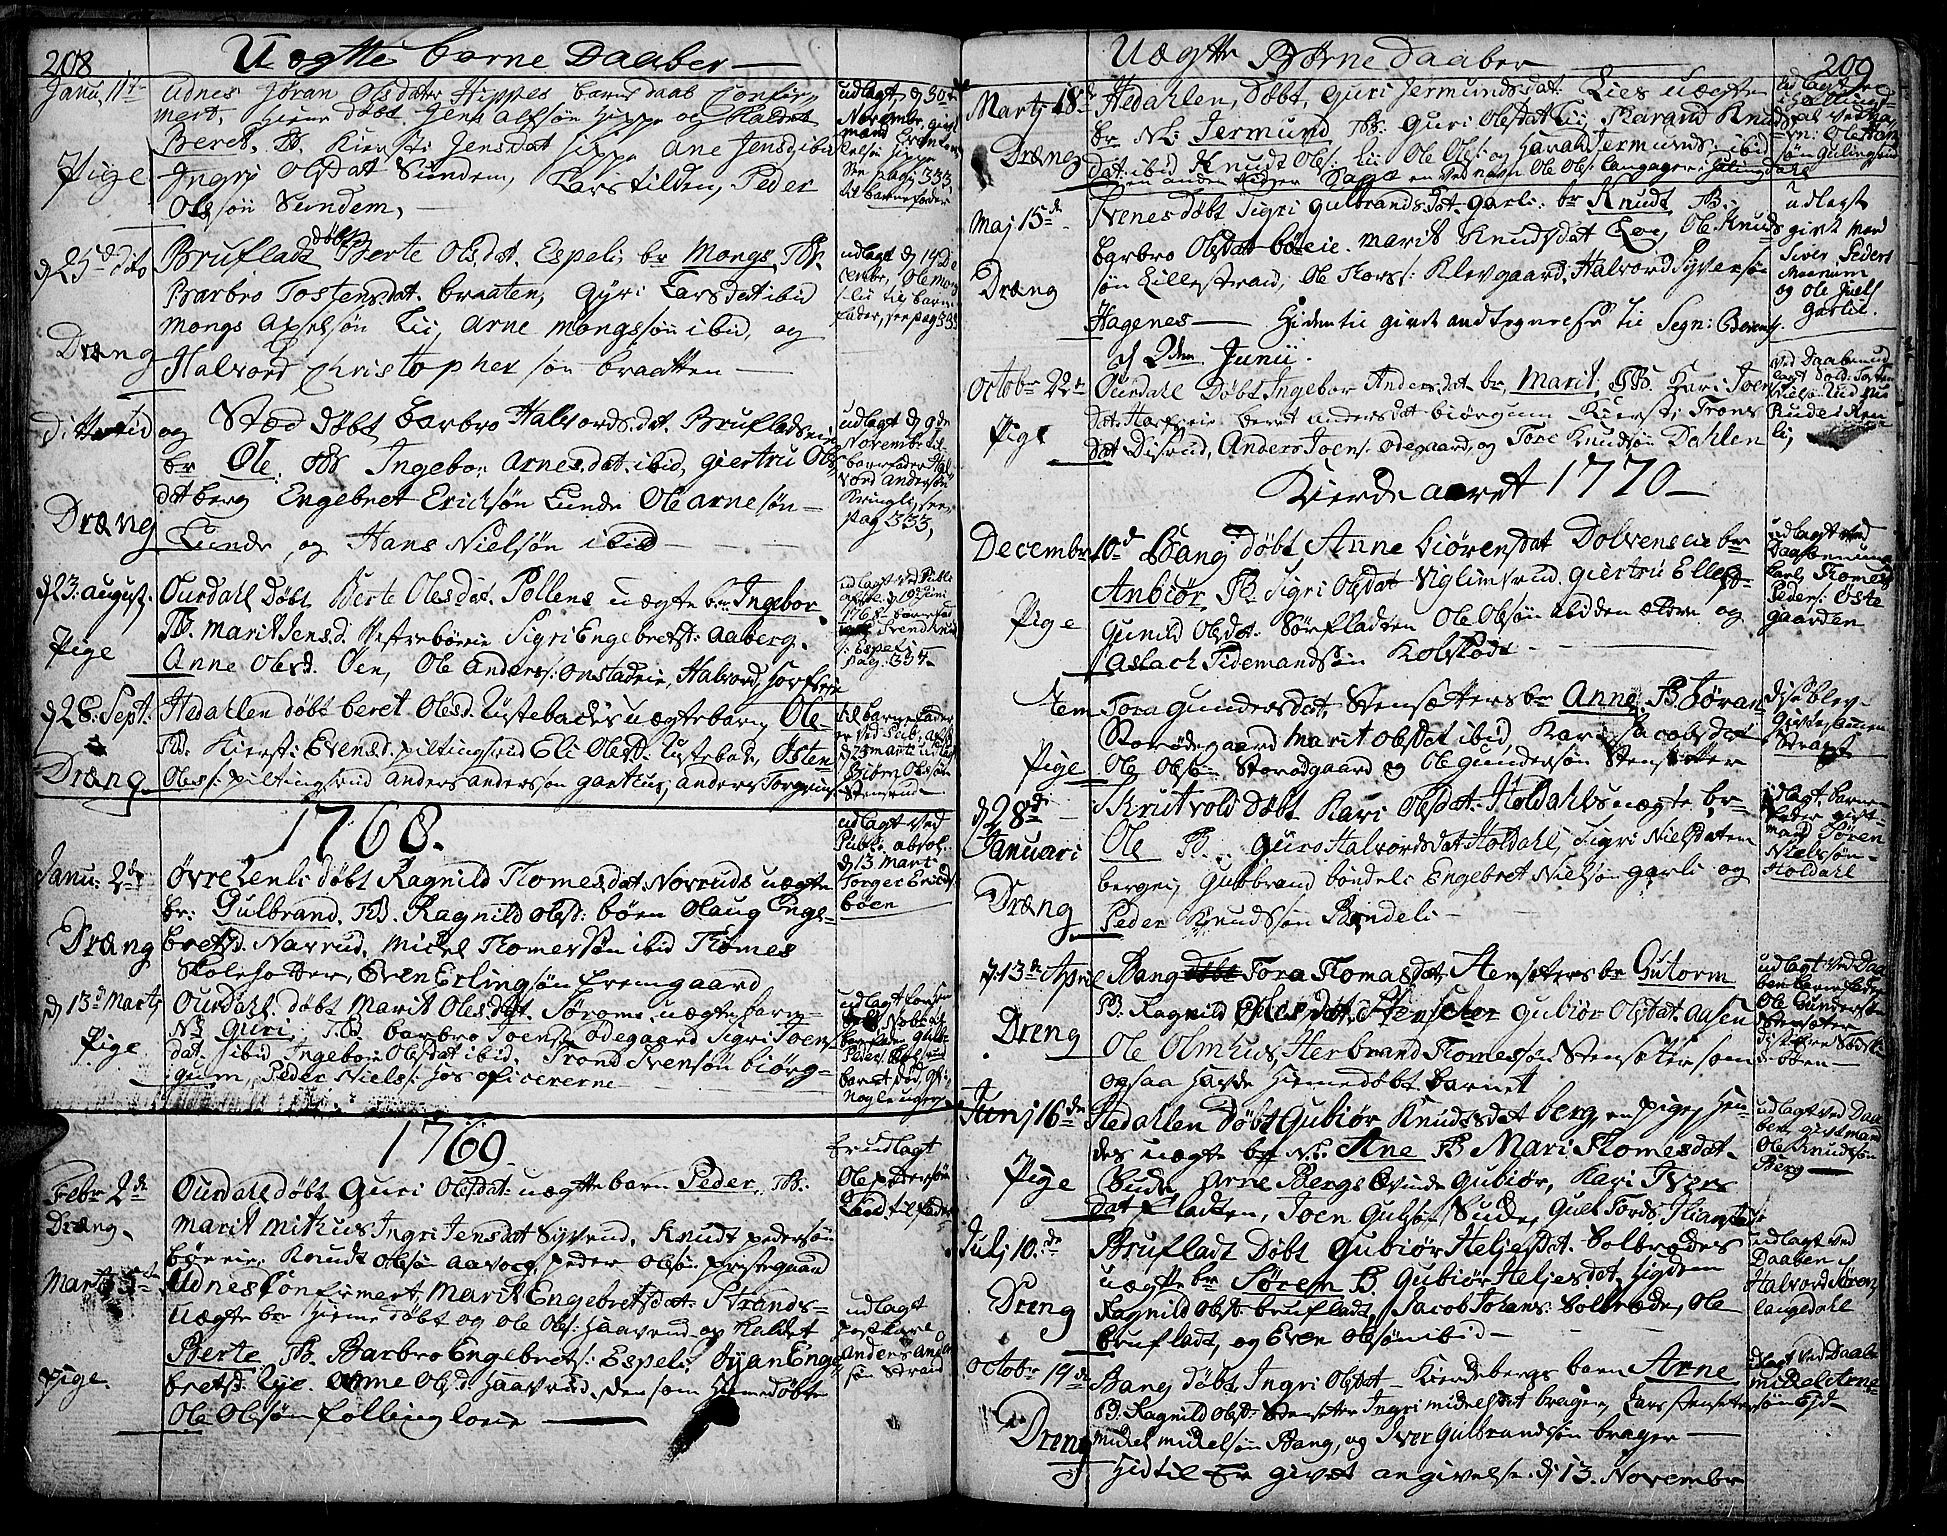 SAH, Aurdal prestekontor, Ministerialbok nr. 5, 1763-1781, s. 208-209